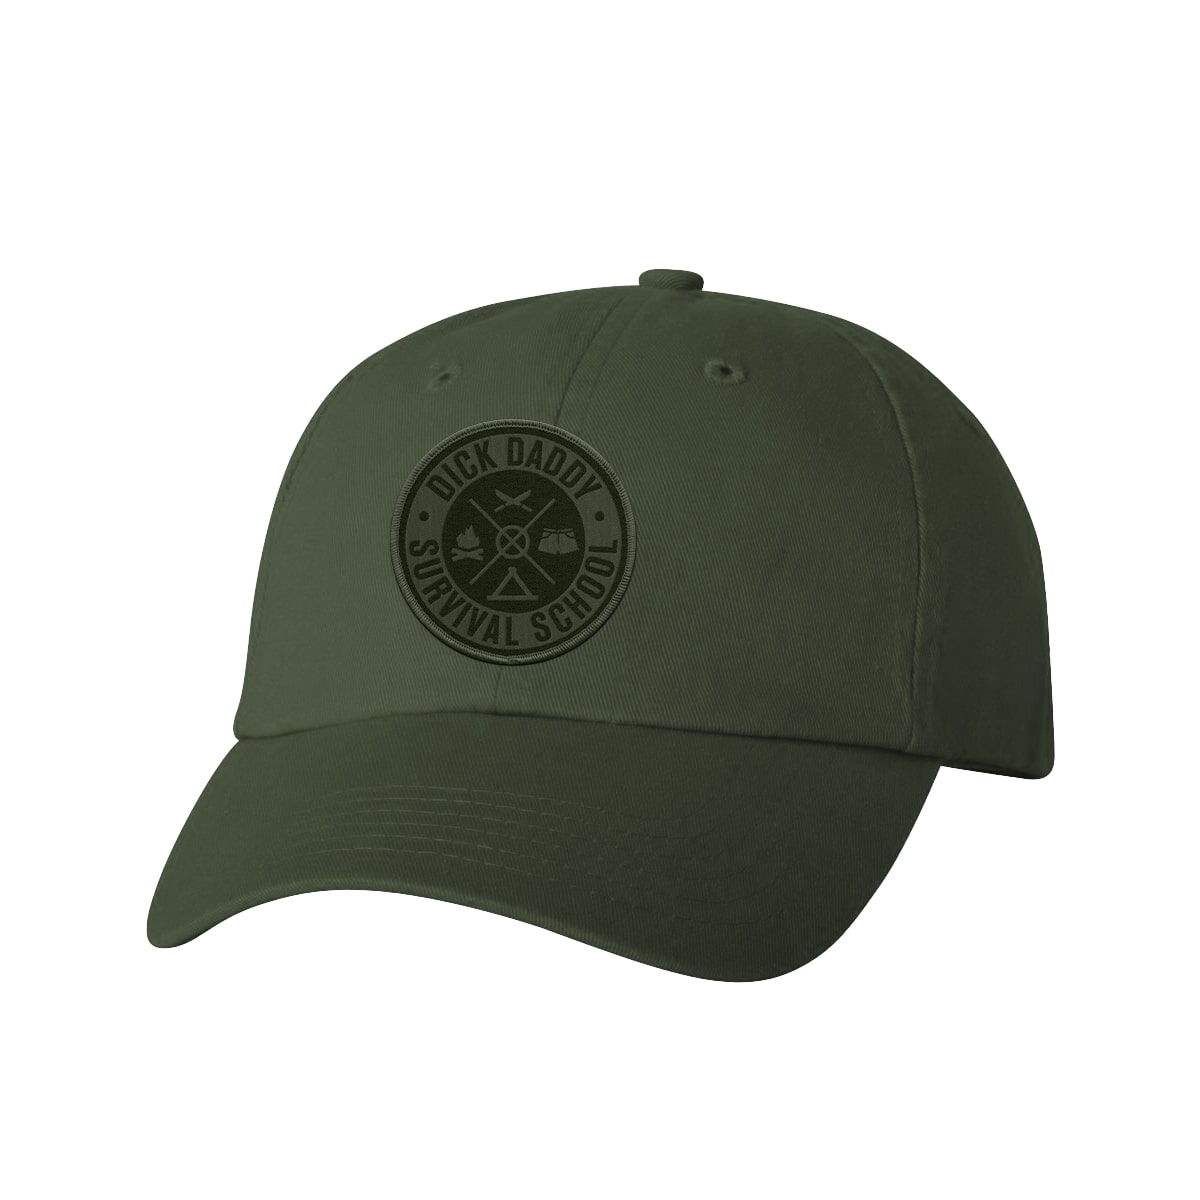 DDSS Patch Green Dad Hat